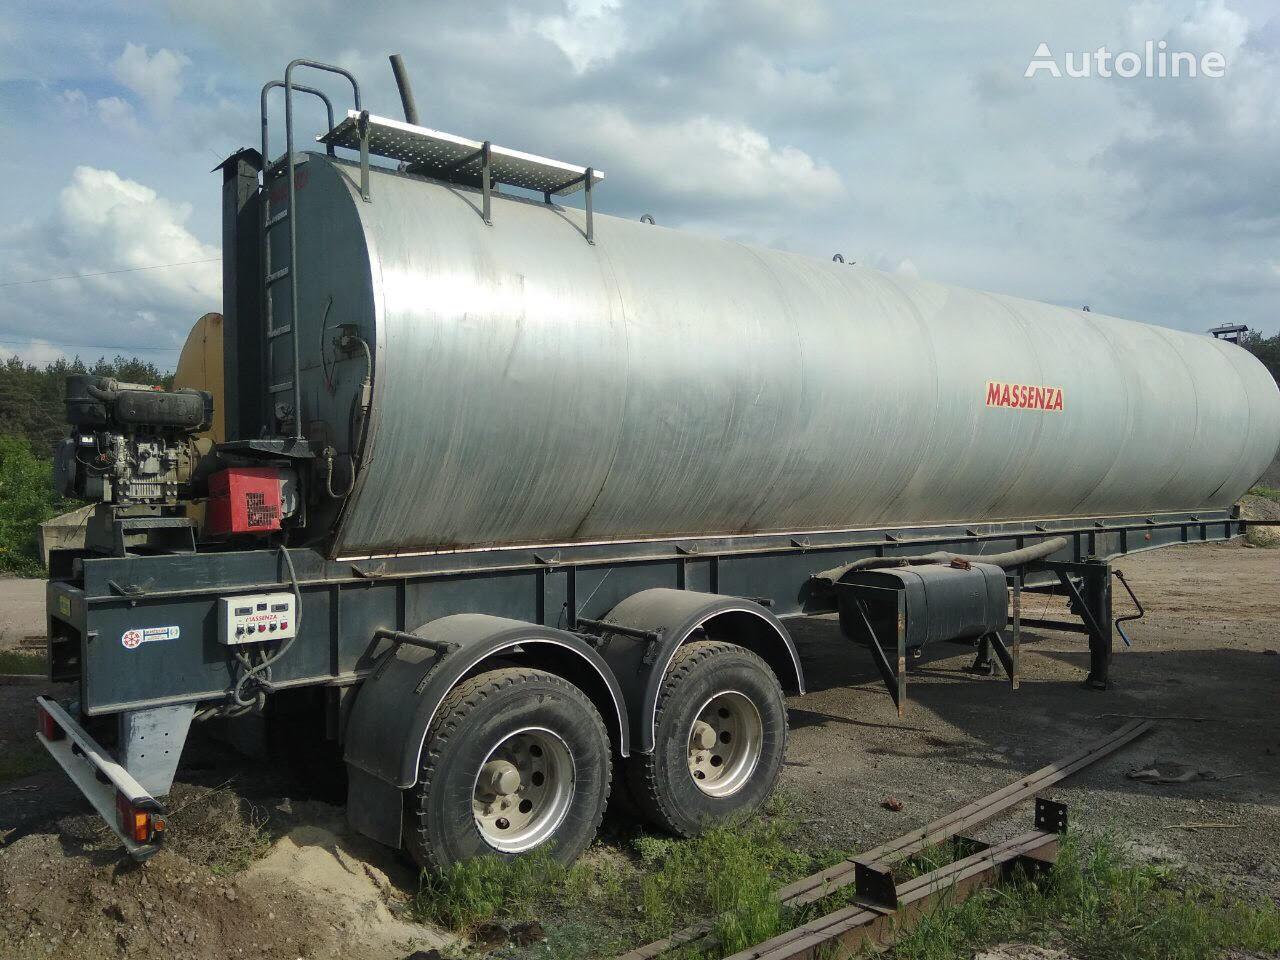 MASSENZA ASR-2 bitumen tank trailer